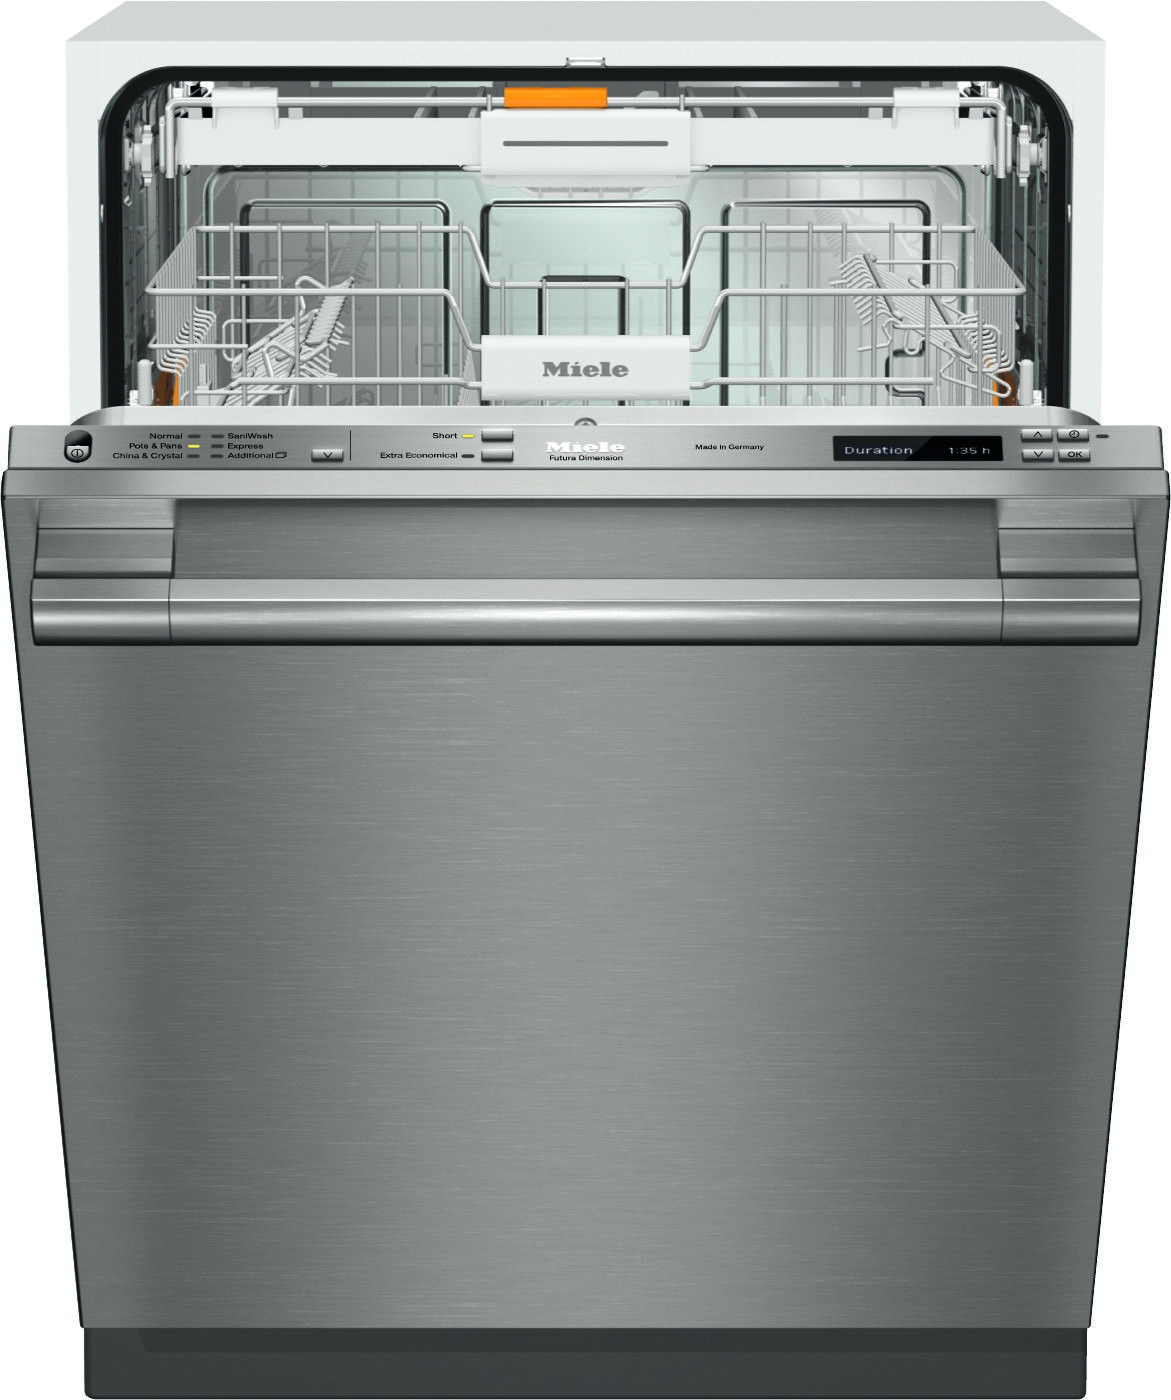 Miele G 6365 Scvi Sf Dimension Dishwasher Integrated Dishwasher Built In Dishwasher Fully Integrated Dishwasher